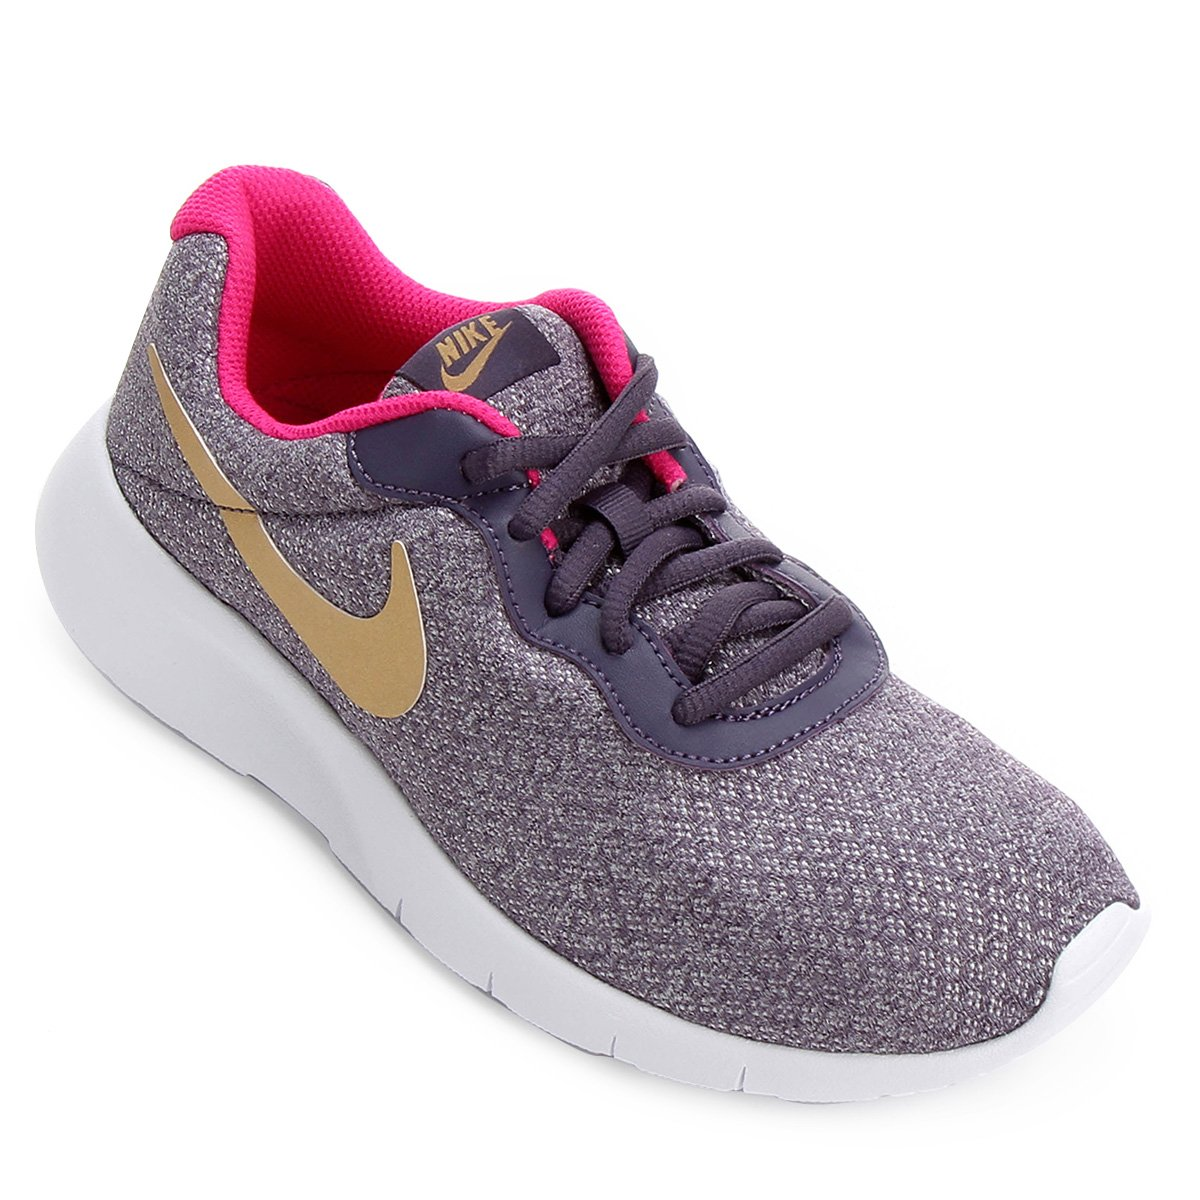 Tênis Infantil Nike Tanjun Masculino - Cinza e Pink - Compre Agora ... 3f73e72cdeca5